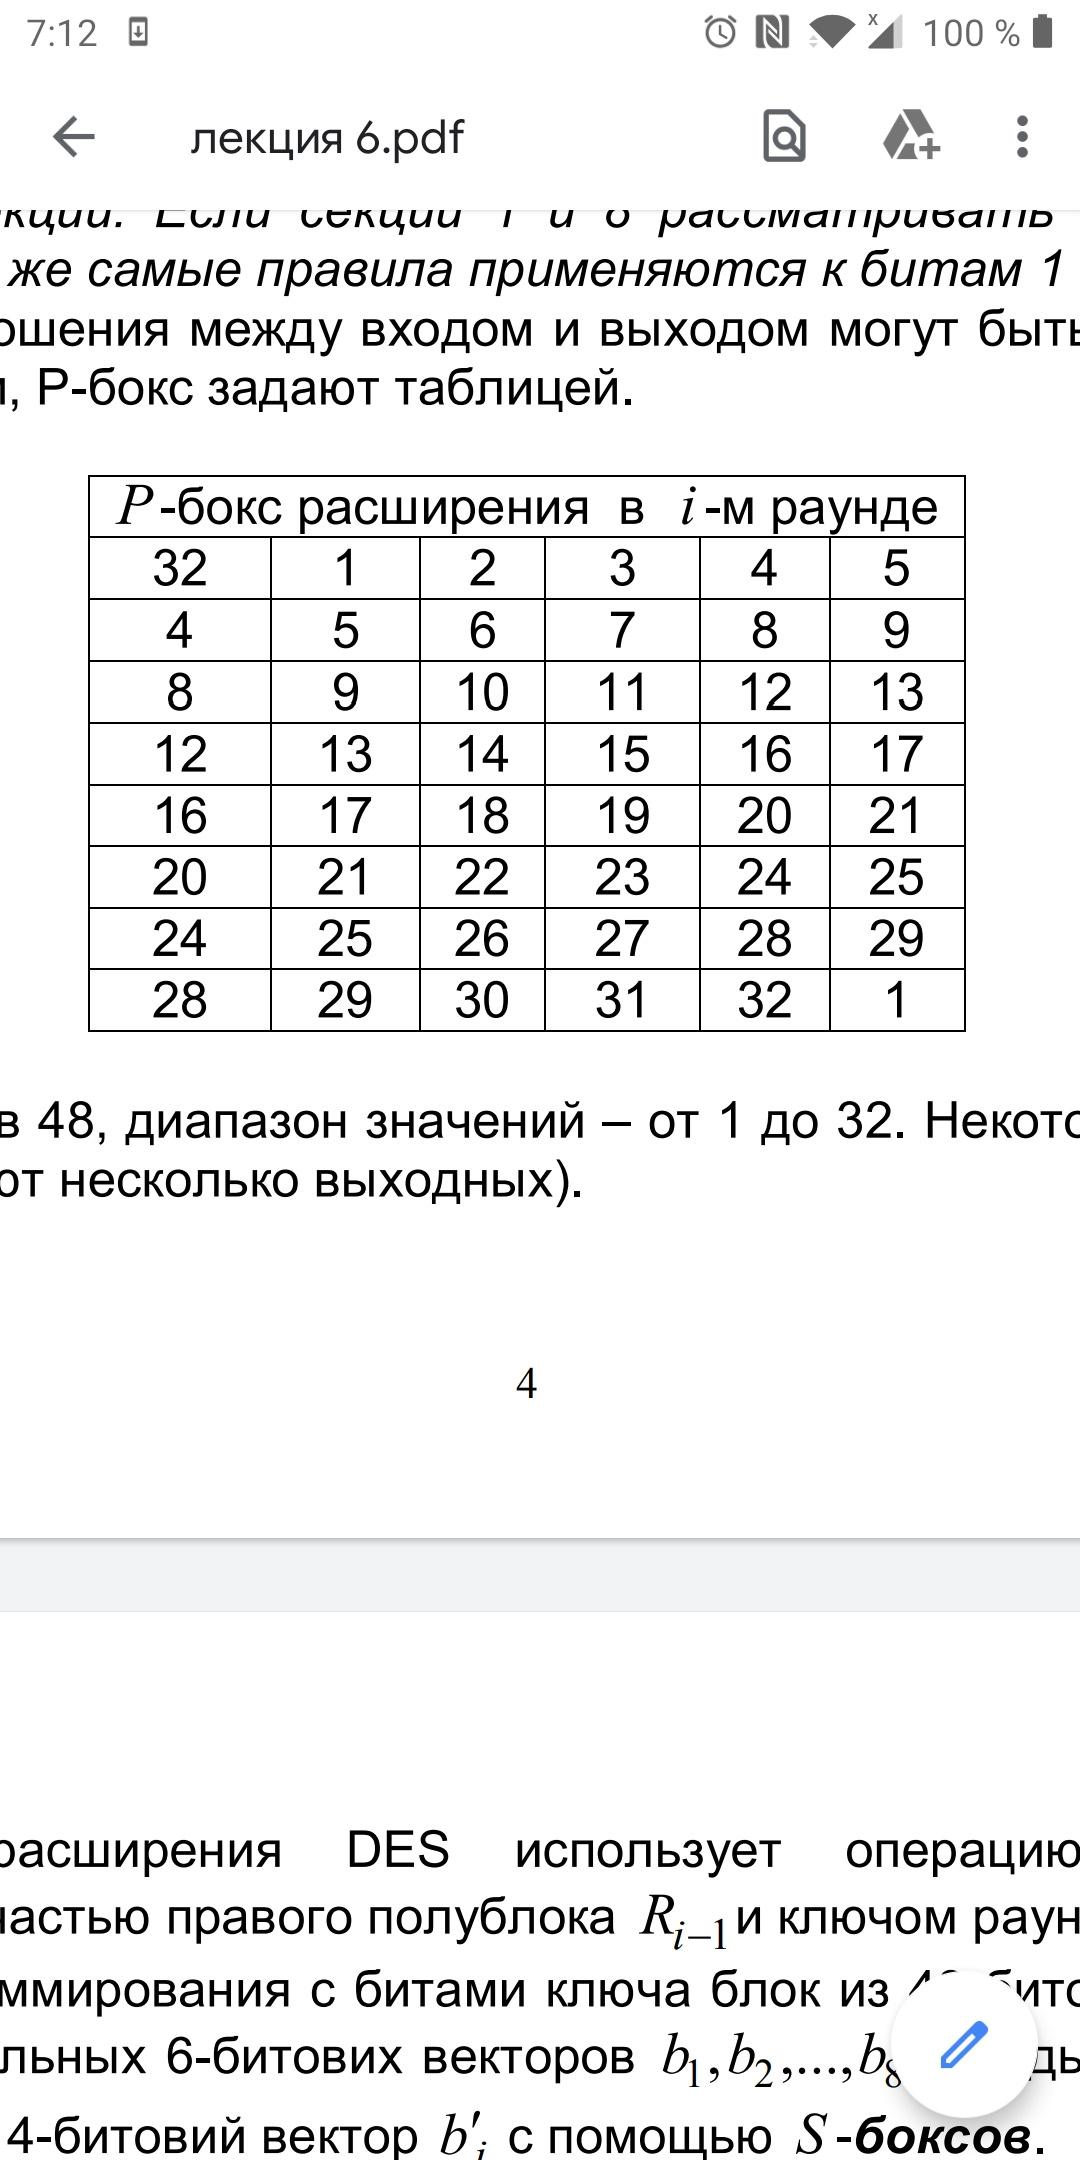 5e3b9232d8b73237304571.jpeg